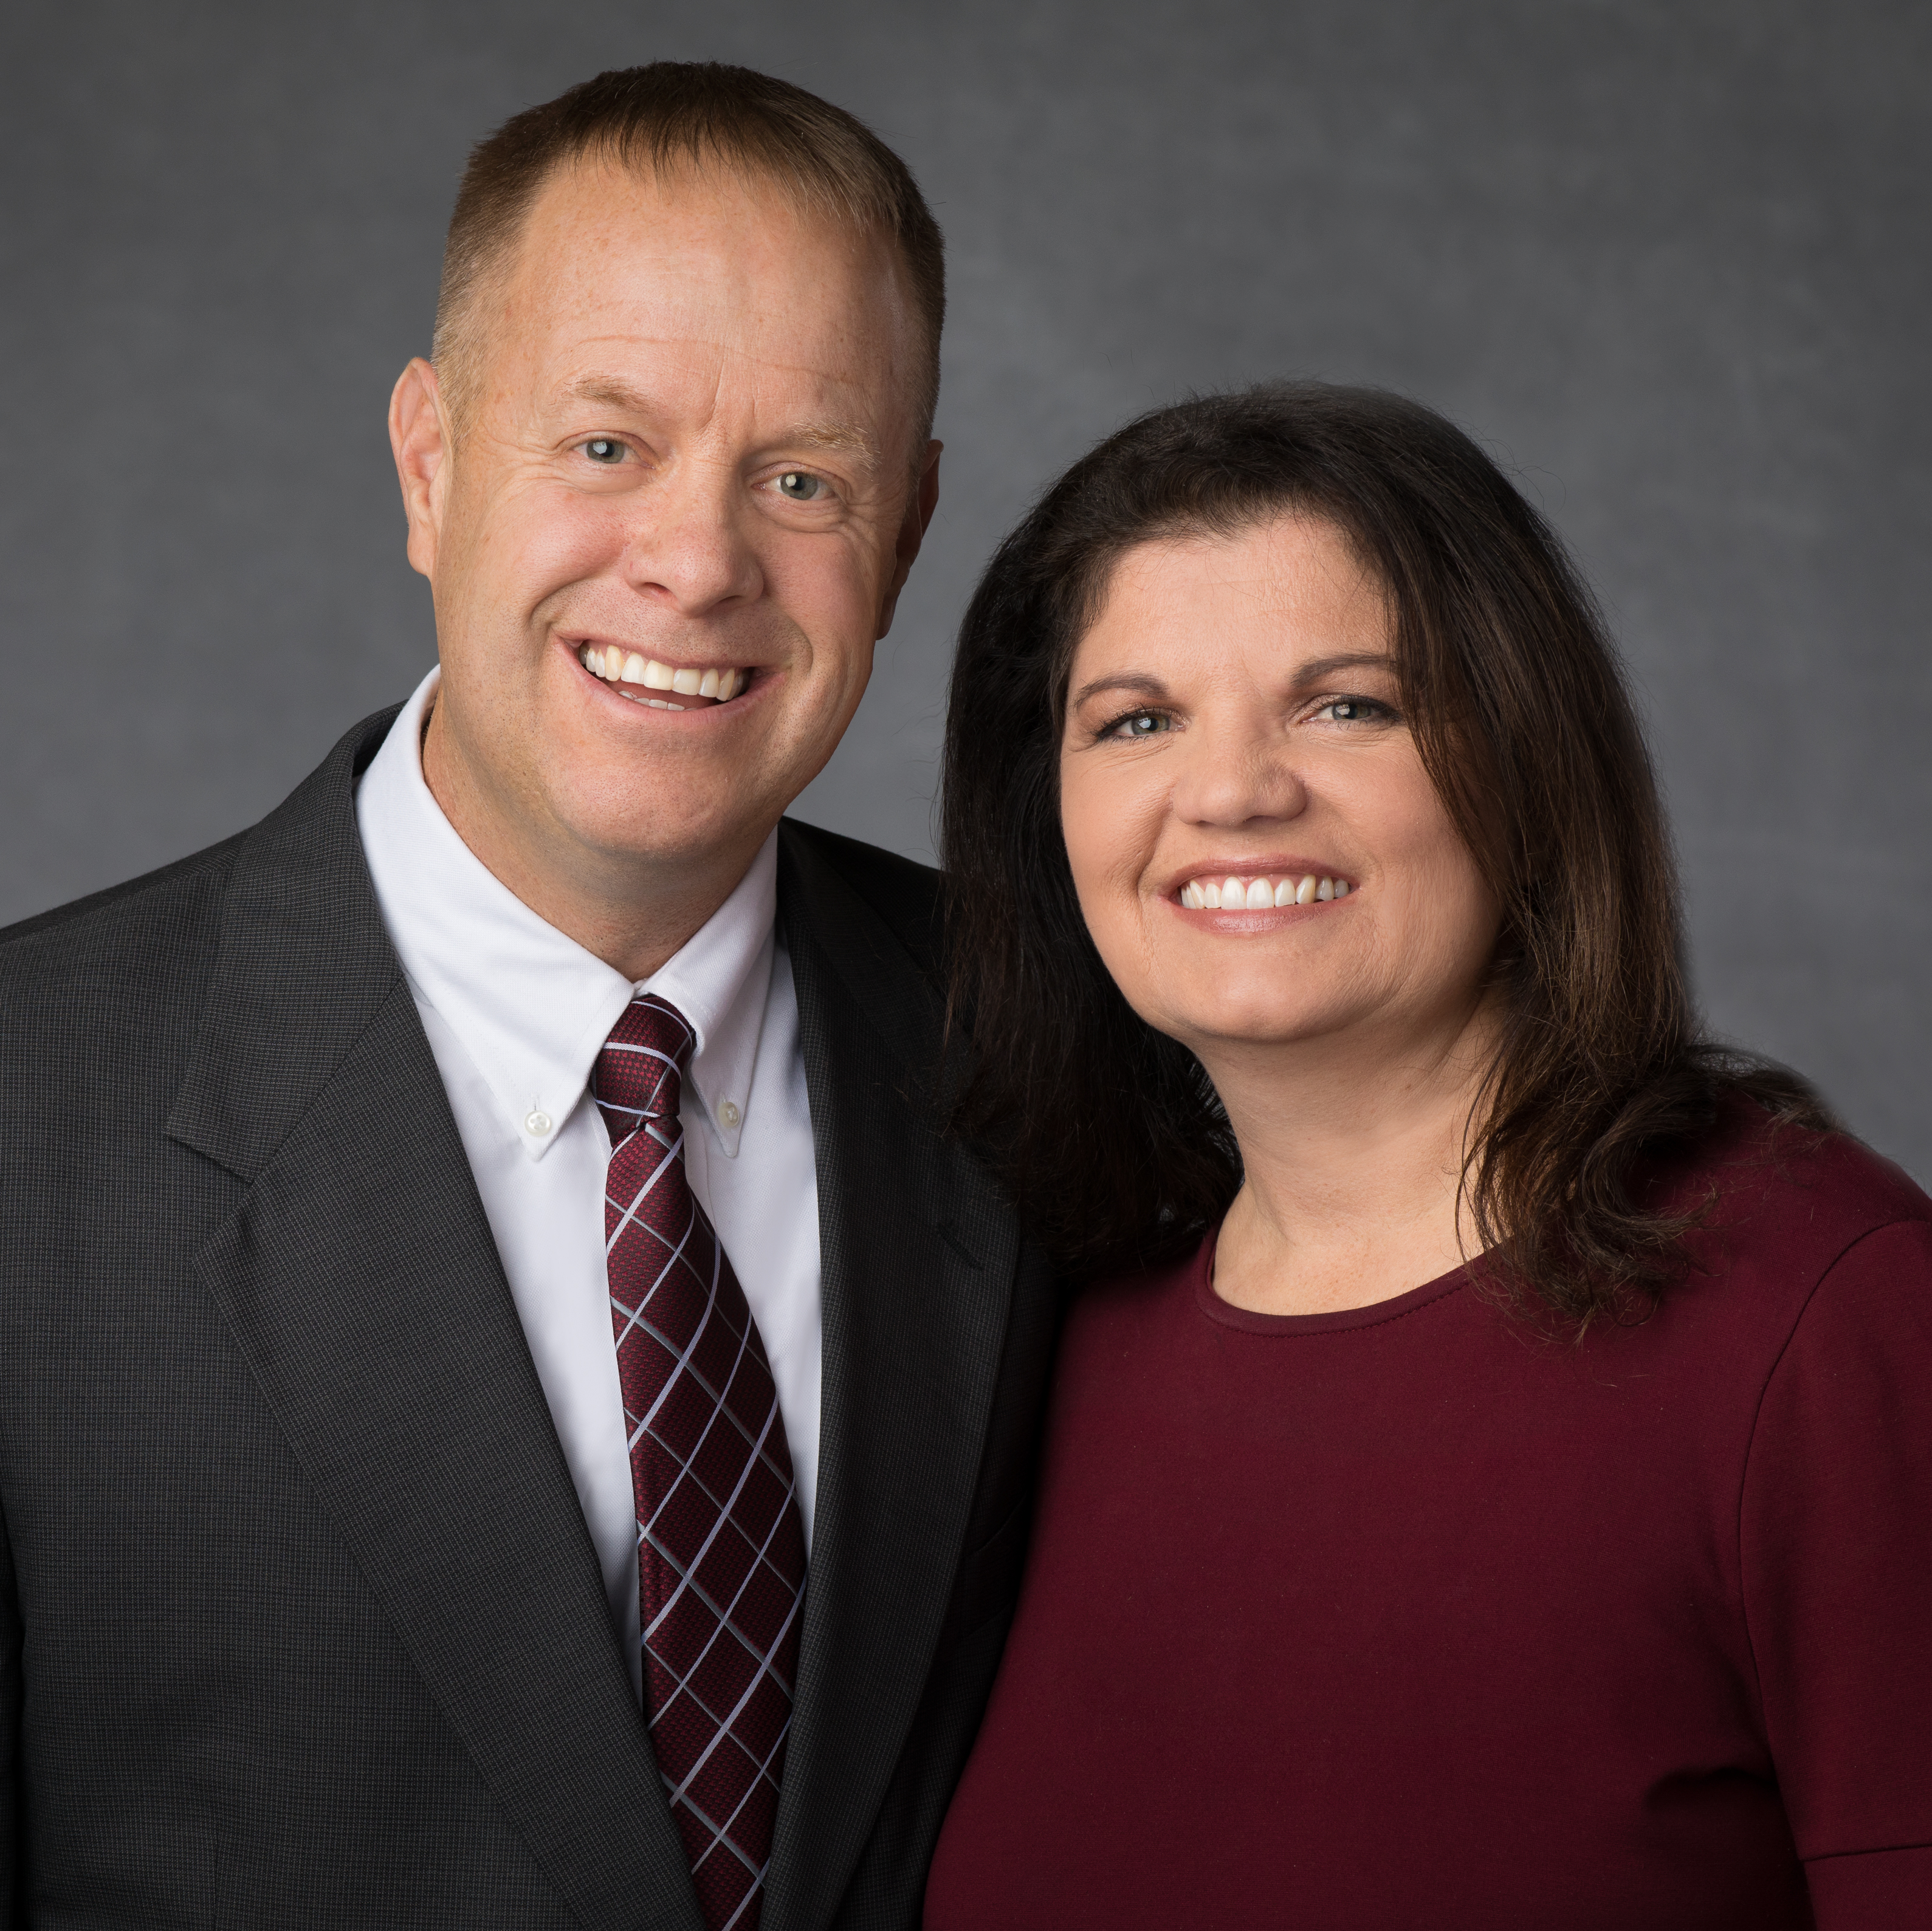 Jonathan G. and Sharon Jannelli Sandberg